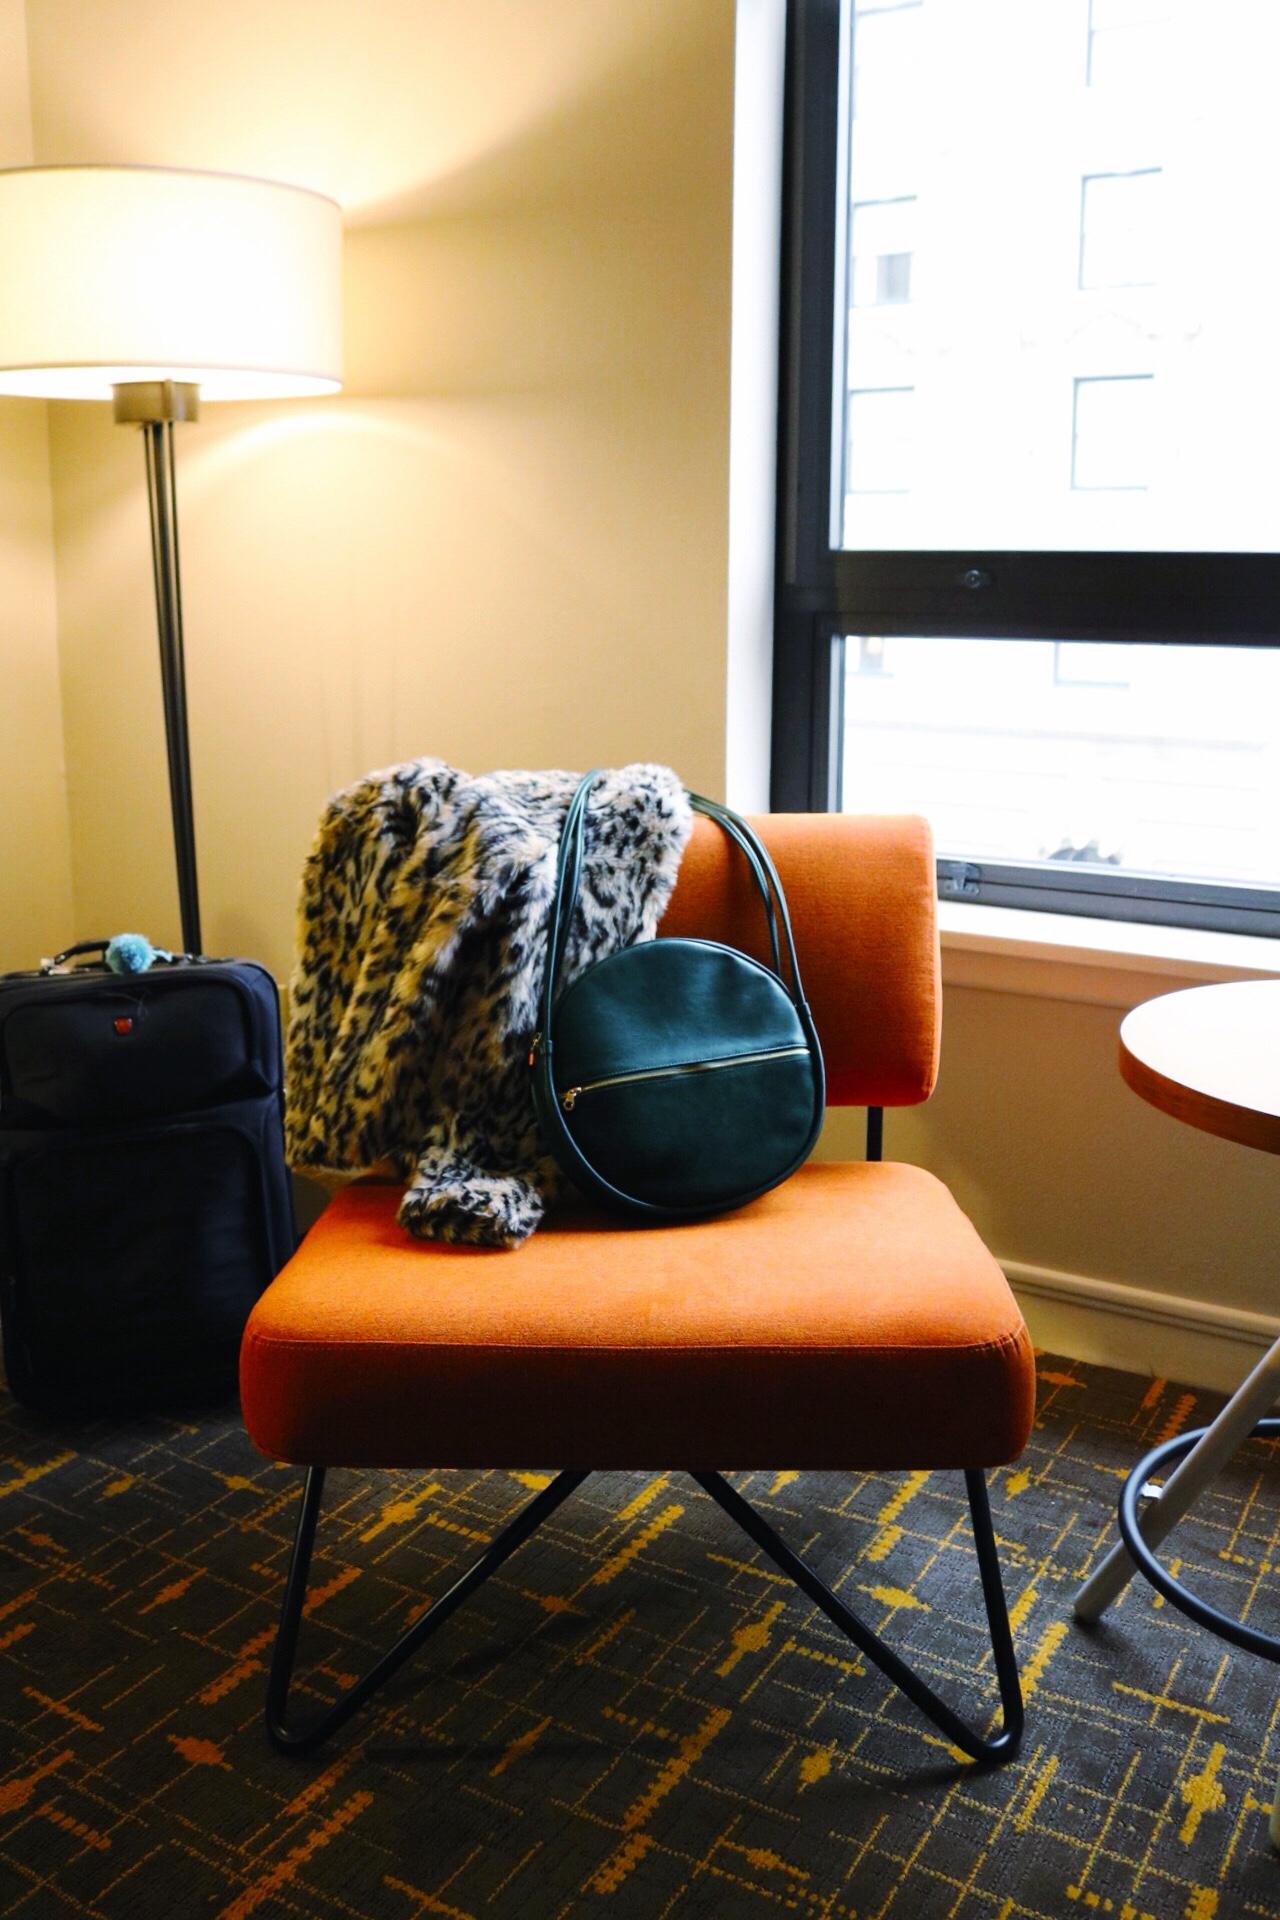 Travel, orange modern chair, San Francisco Hotel, Stanford Court Inn, Ban.do bag, cheetah jacket